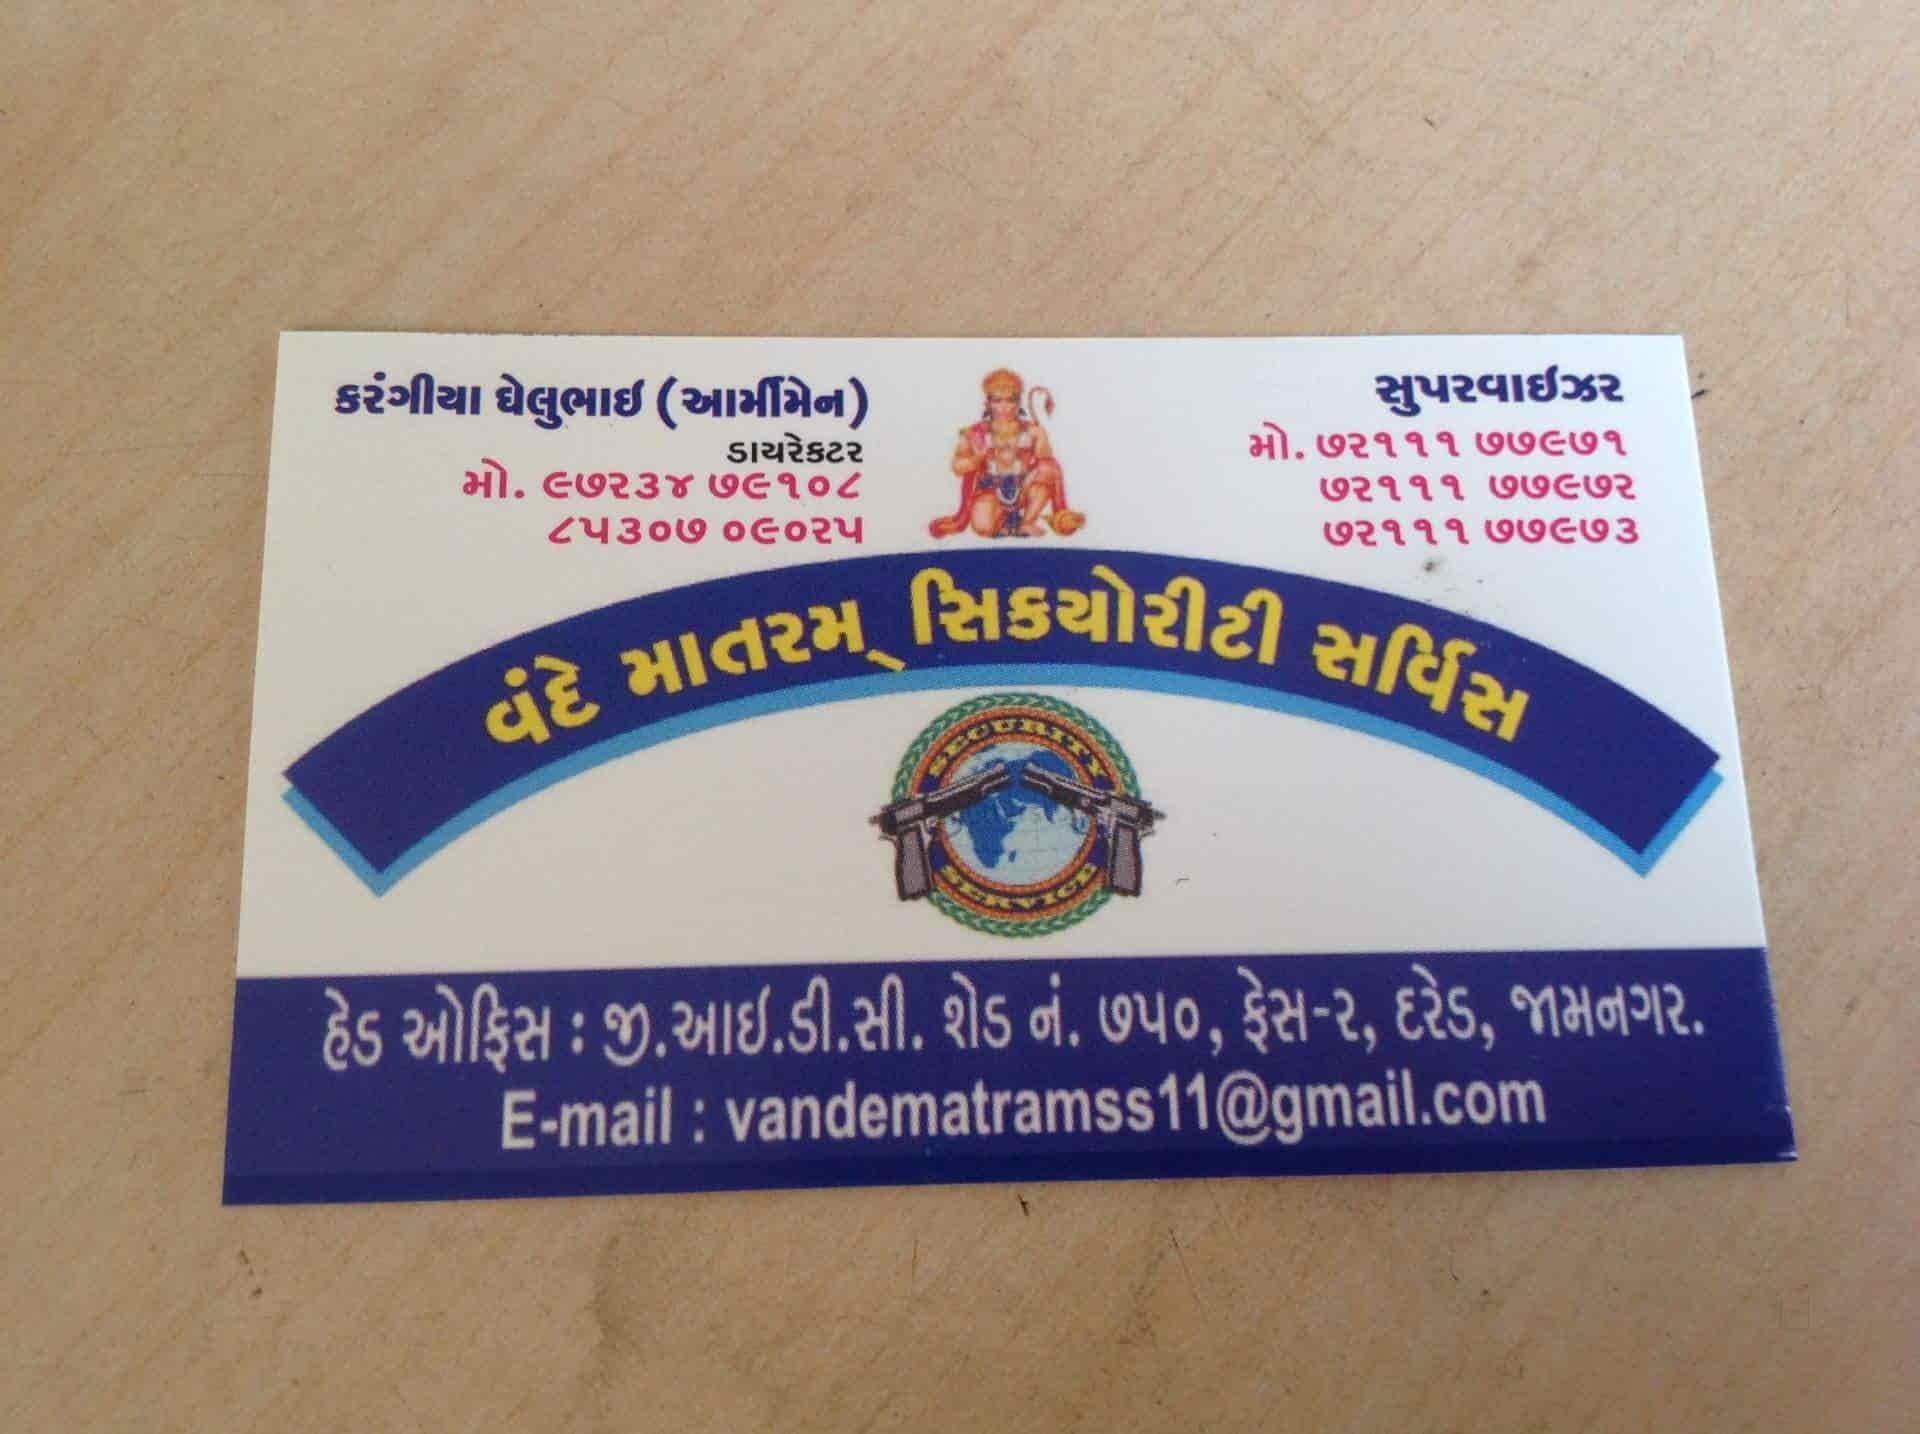 Vande Matram Security Service, GIDC Dared - Security